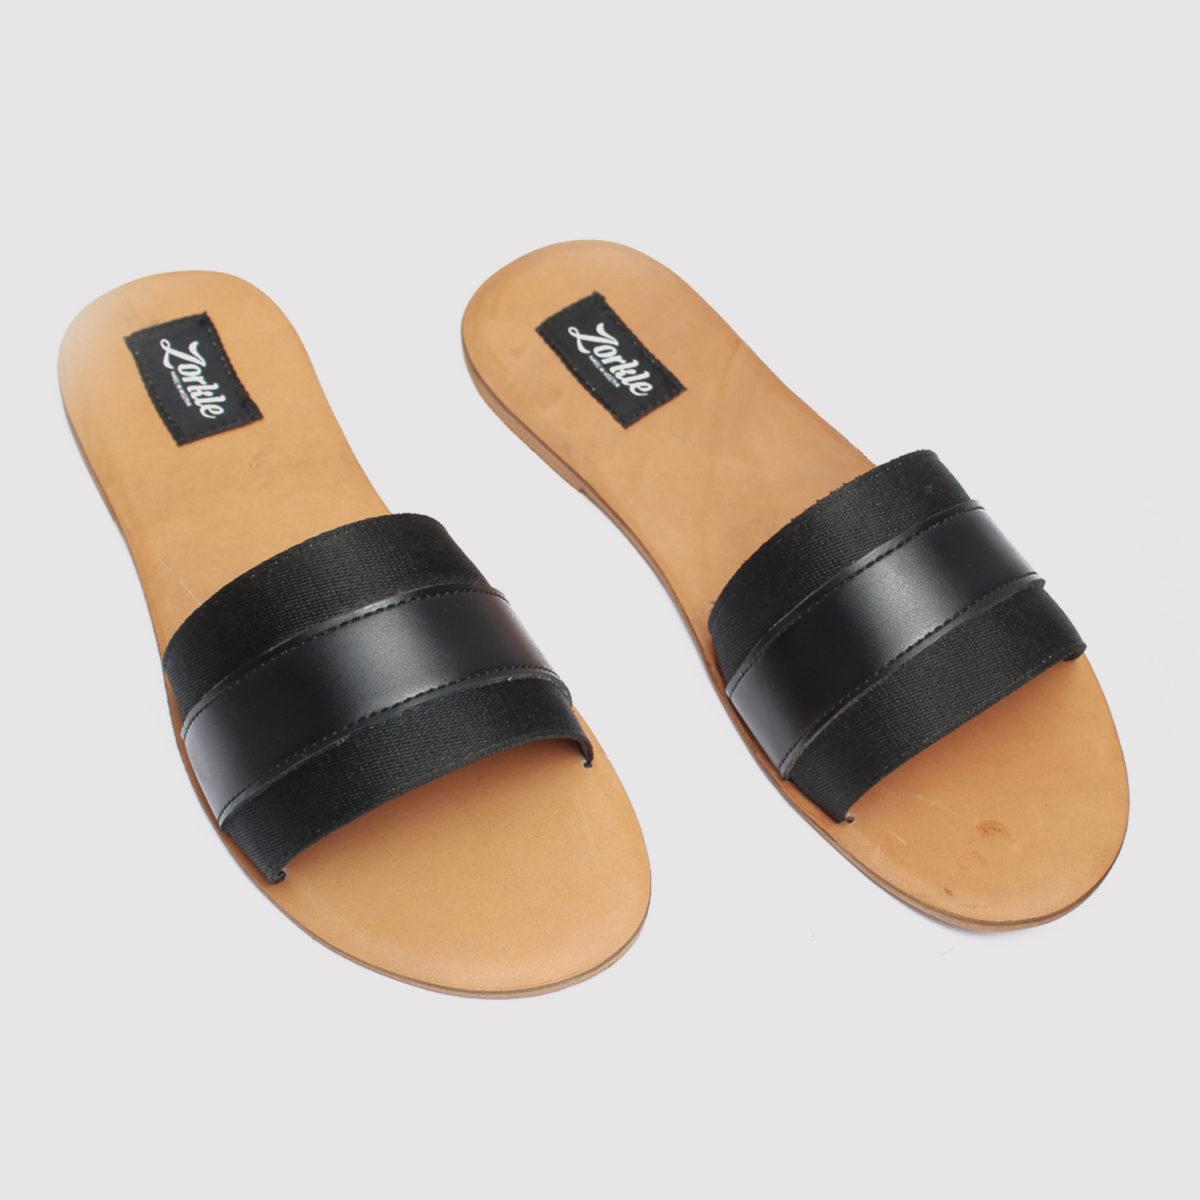 Lere flex black leather zorkle shoes in lagos nigeria